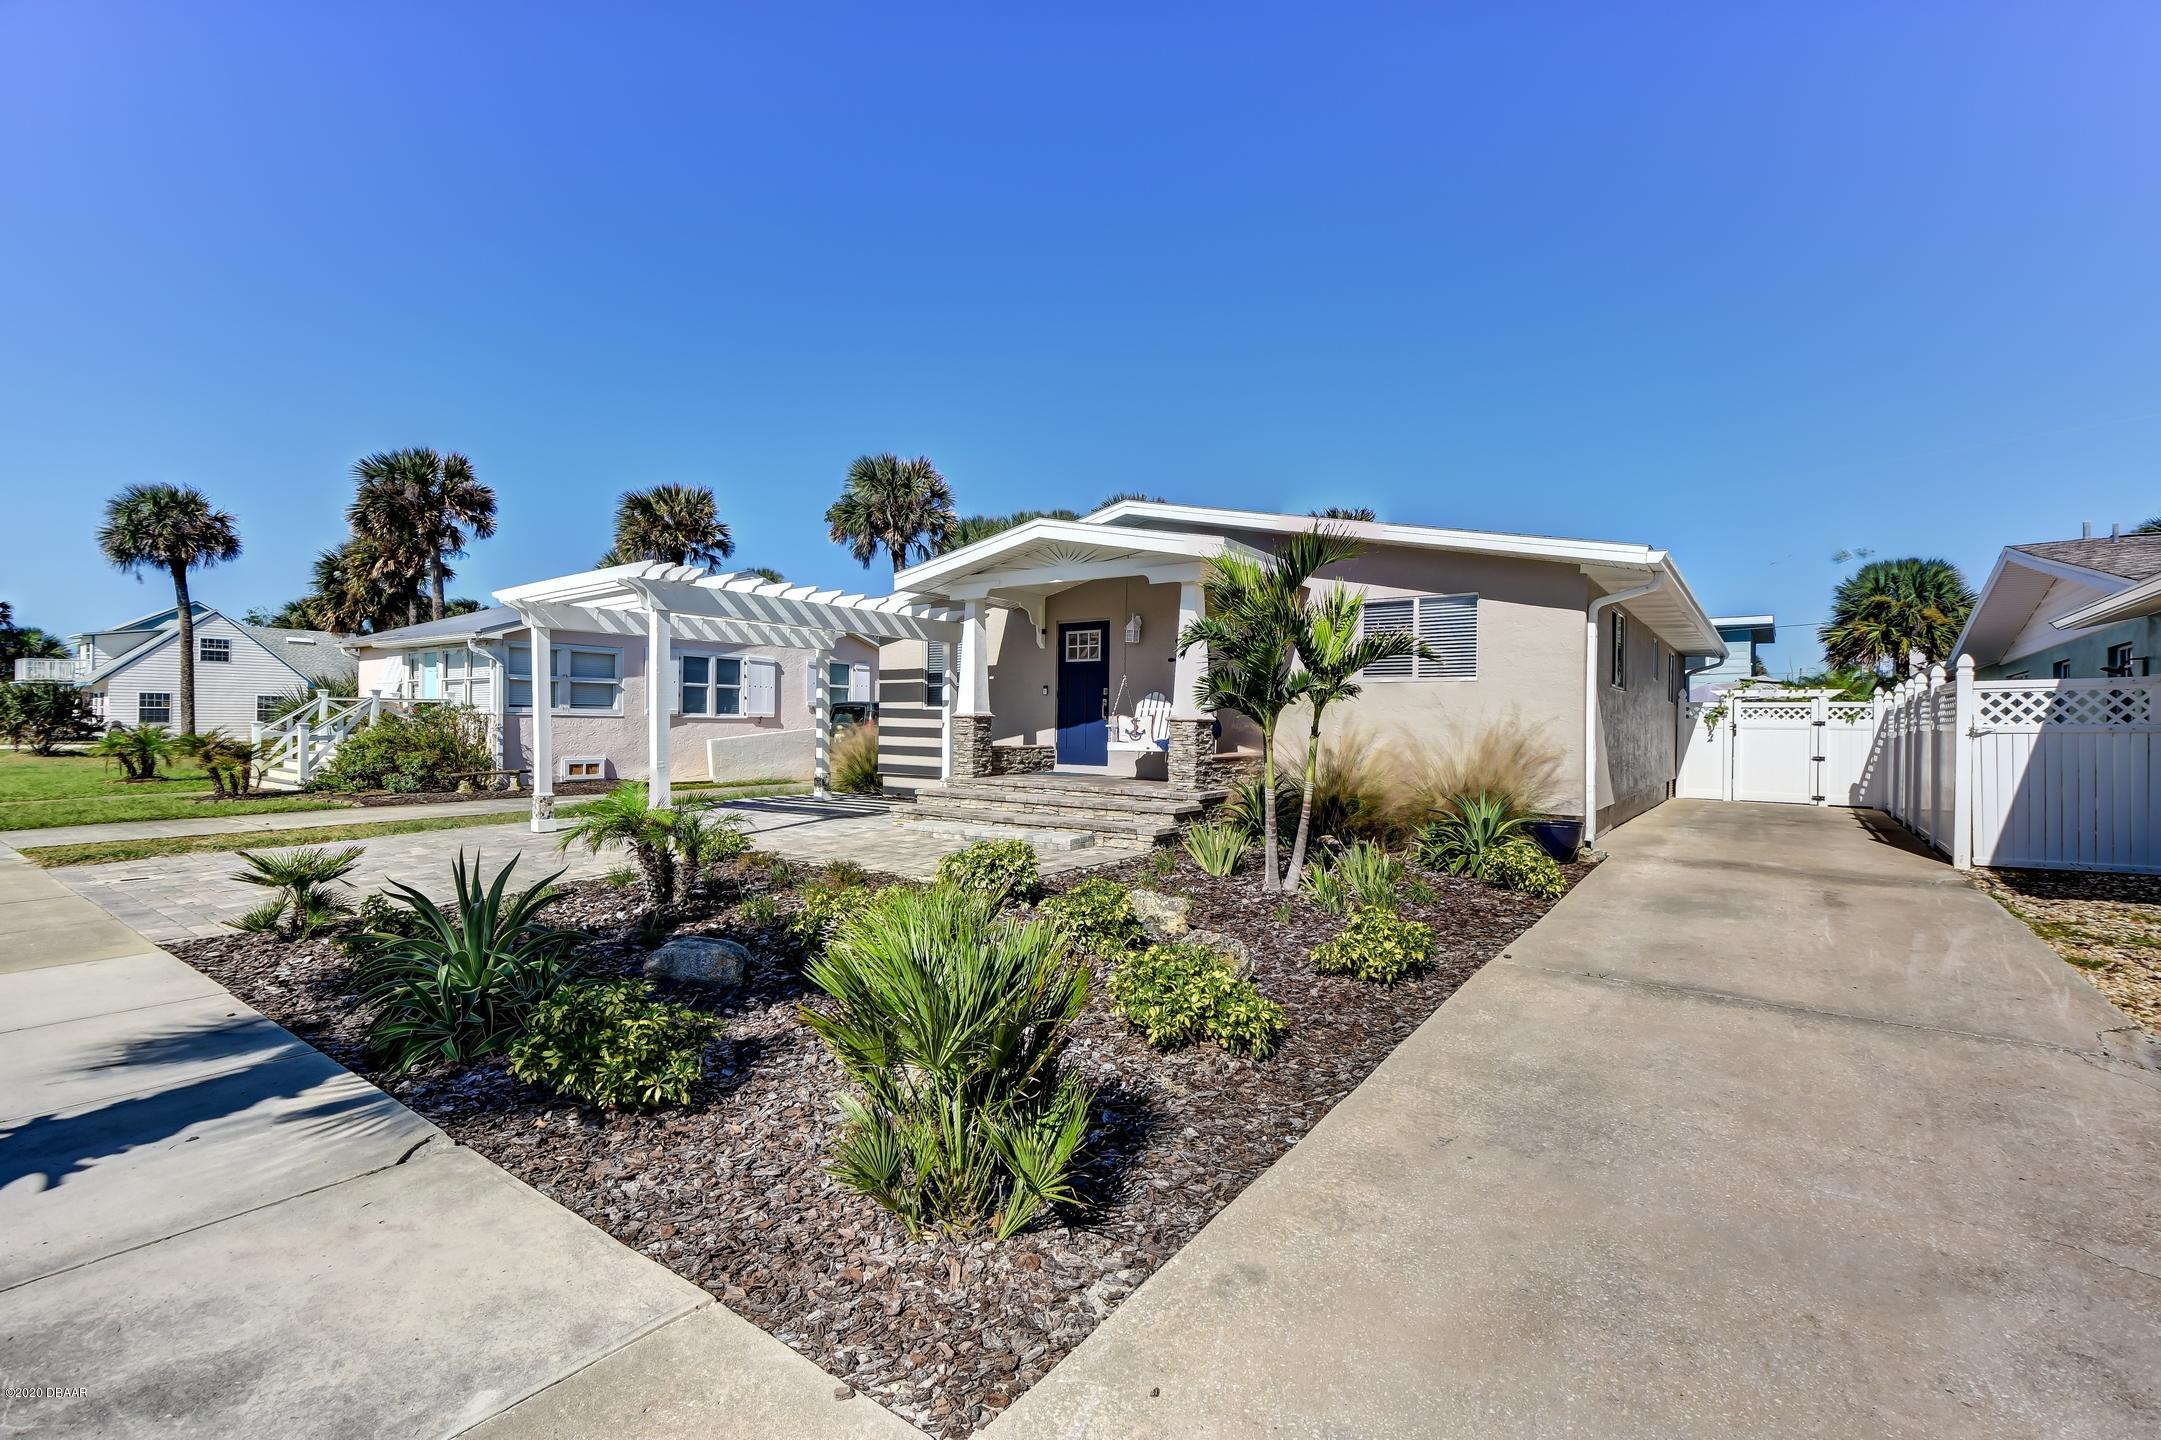 310 Crawford New Smyrna Beach - 1